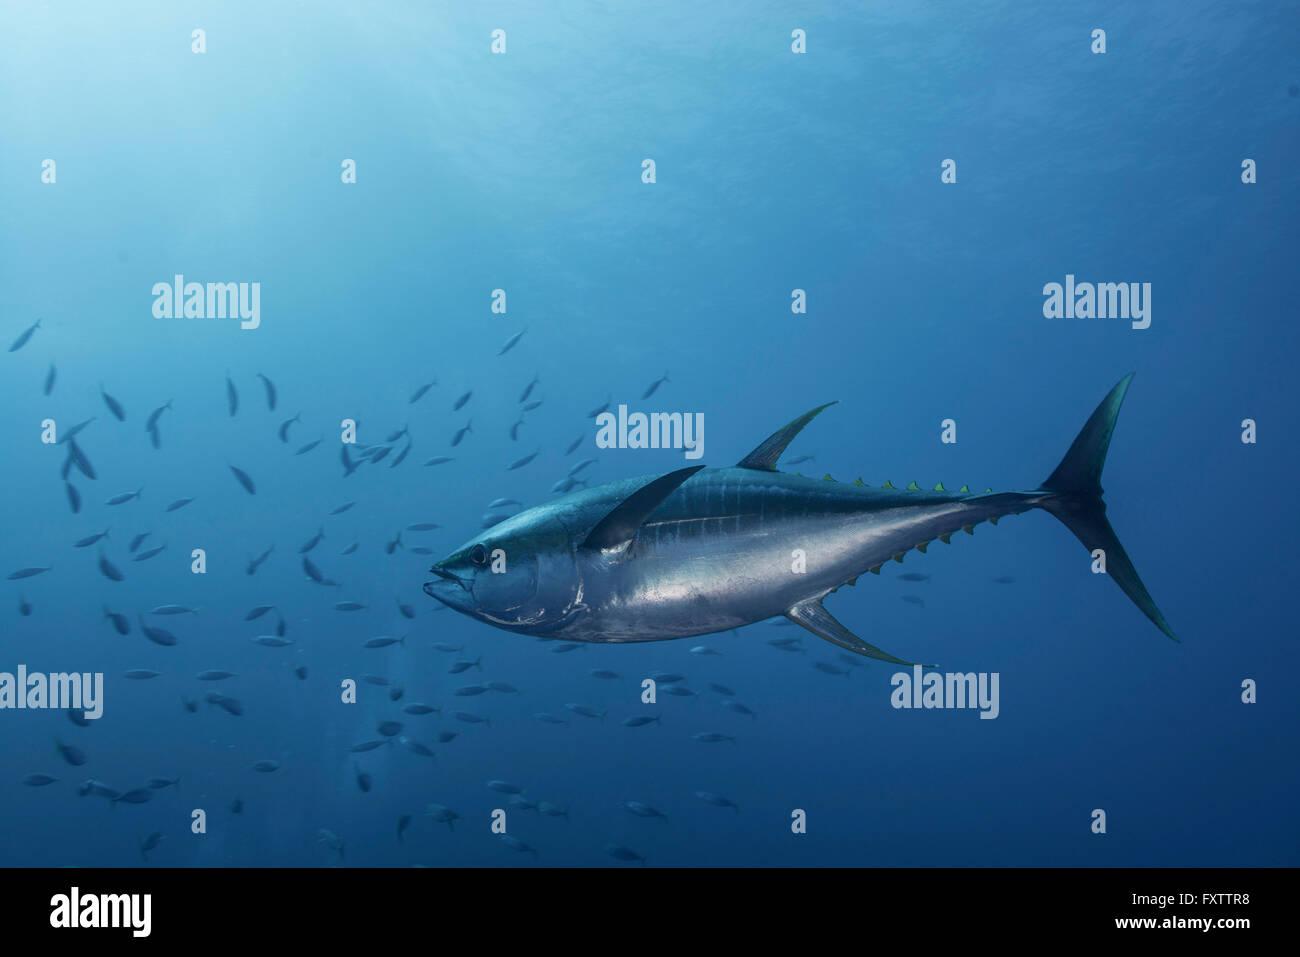 Large Yellowfin Tuna (Thunnus Albacares) launches at amazing speed towards school of mackerel - Stock Image